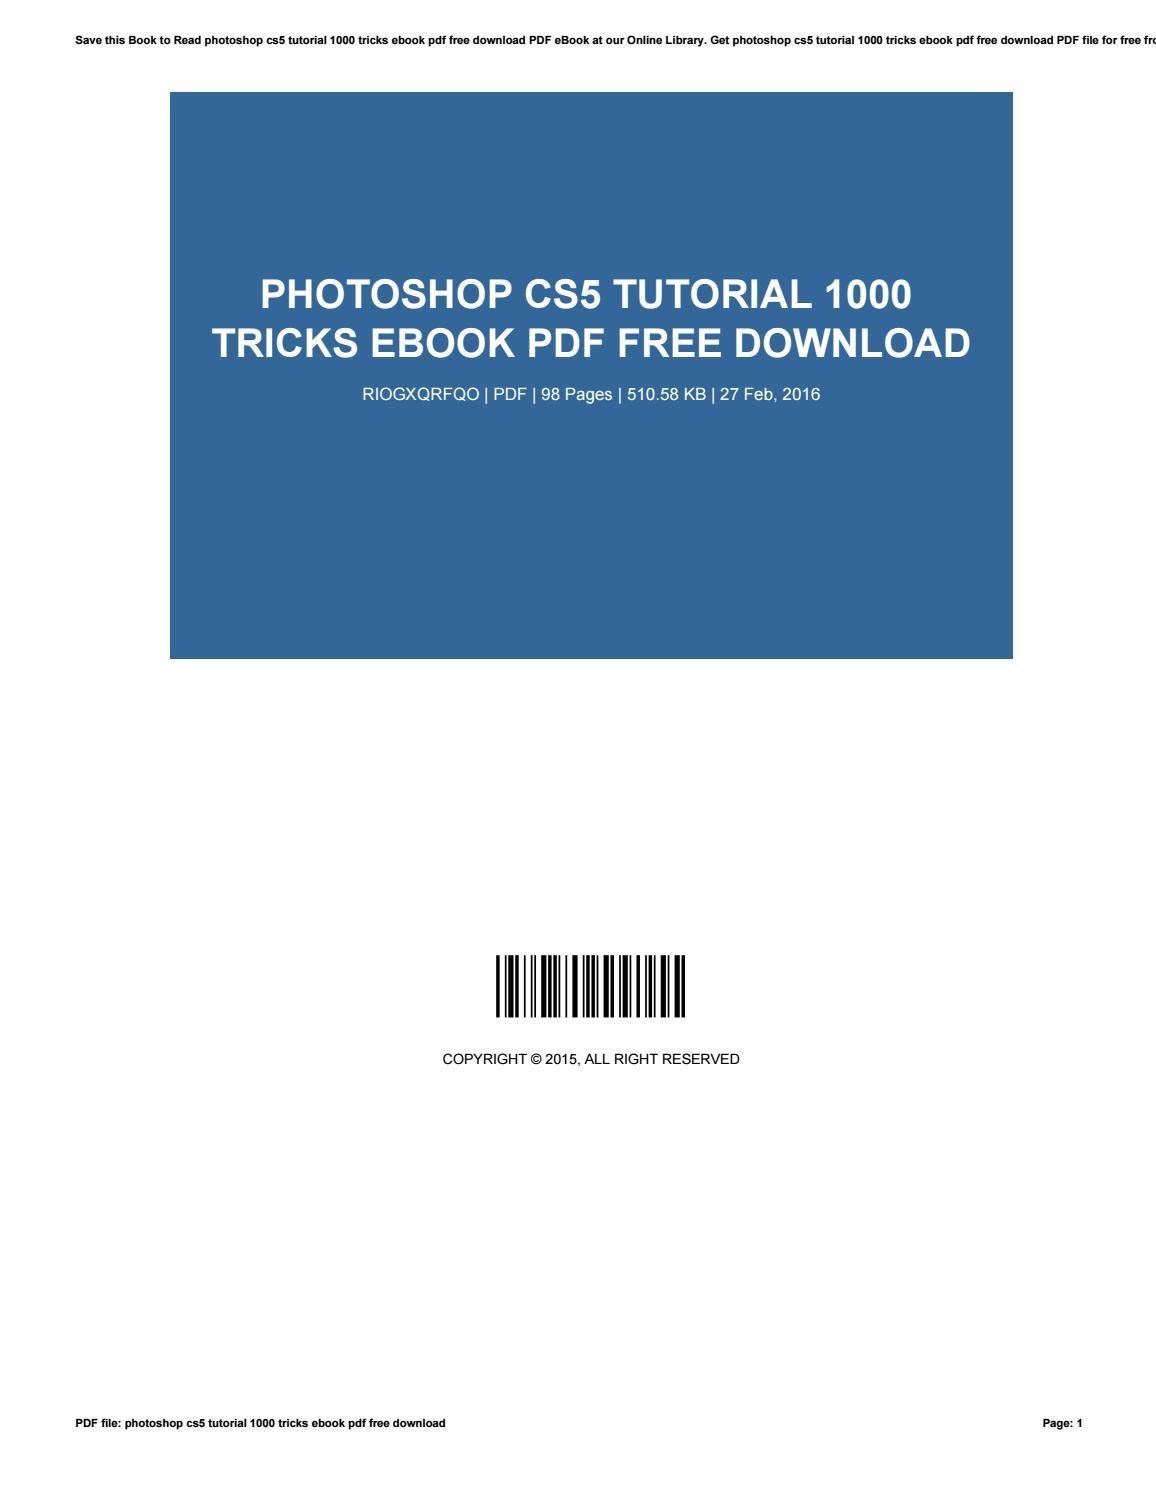 Photoshop cs5 tutorial 1000 tricks ebook pdf free download by photoshop cs5 tutorial 1000 tricks ebook pdf free download by franklinbeaver1647 issuu baditri Gallery